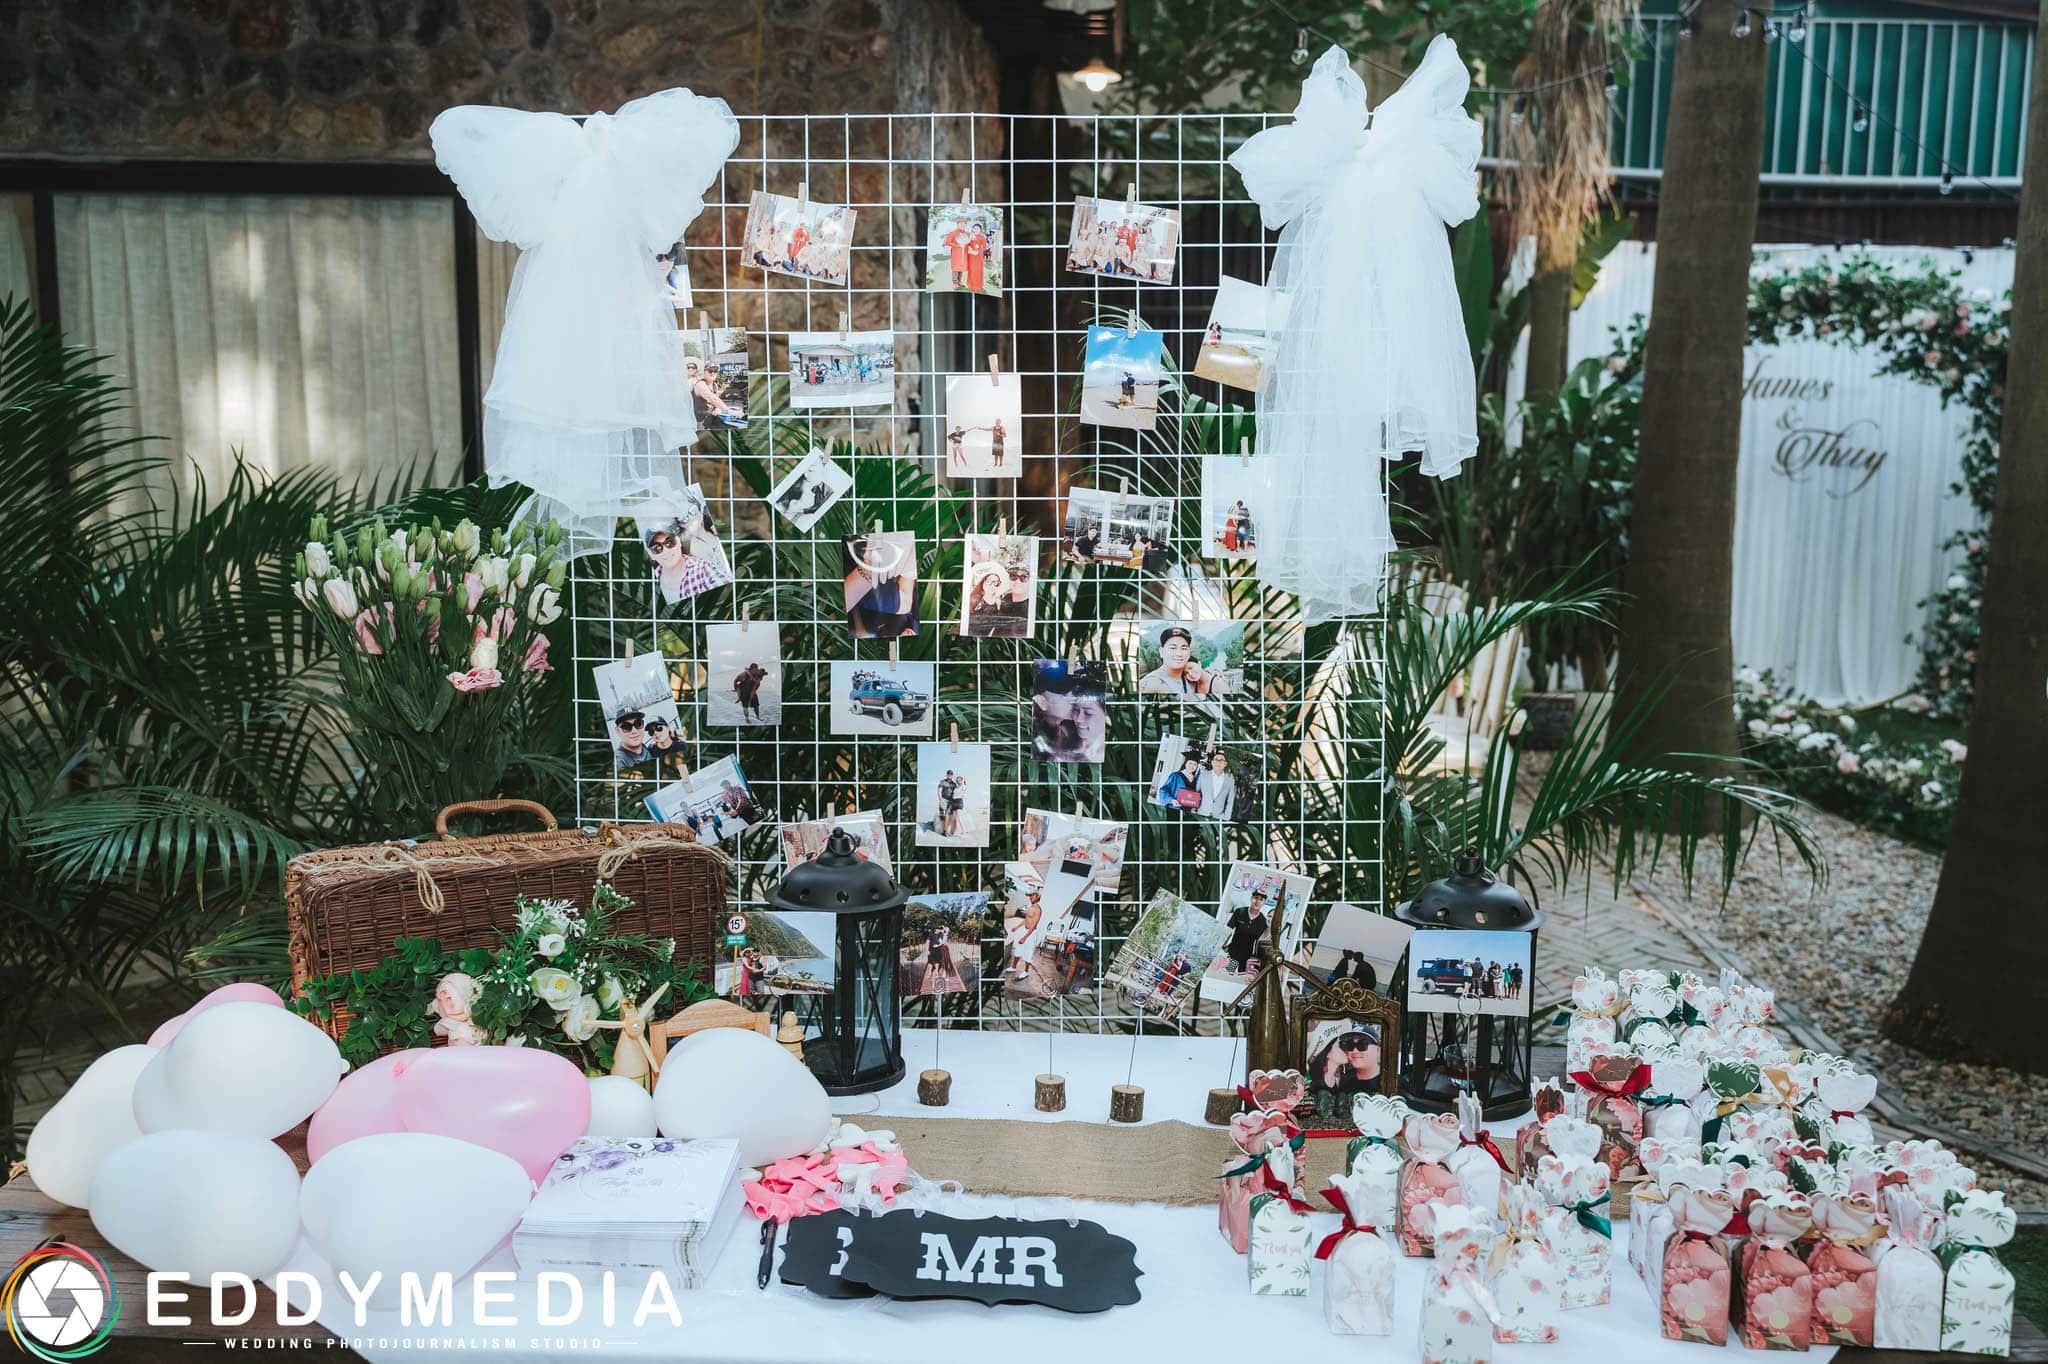 Phongsucuoi James KieuThuy EddyMedia 12 tiệc cưới ngoài trời